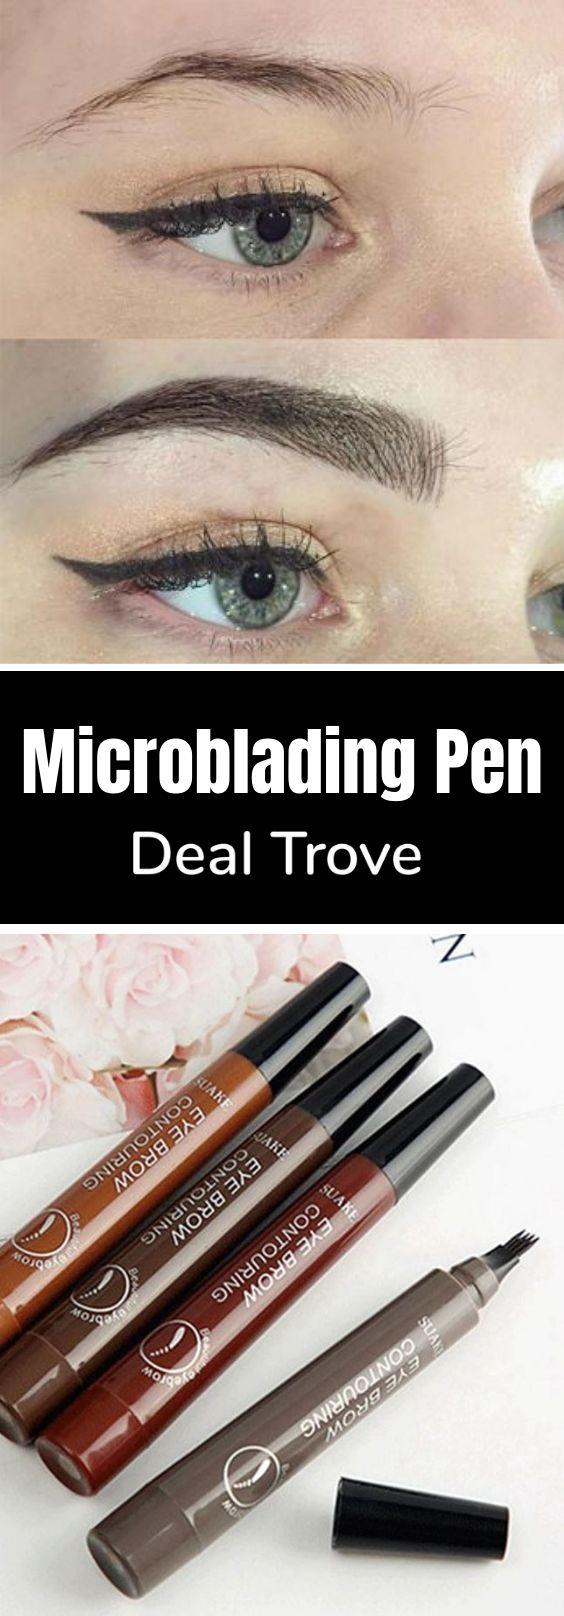 Waterproof Microblading Eyebrow Pen – ⭐⭐⭐⭐⭐ (5/5 Stars)